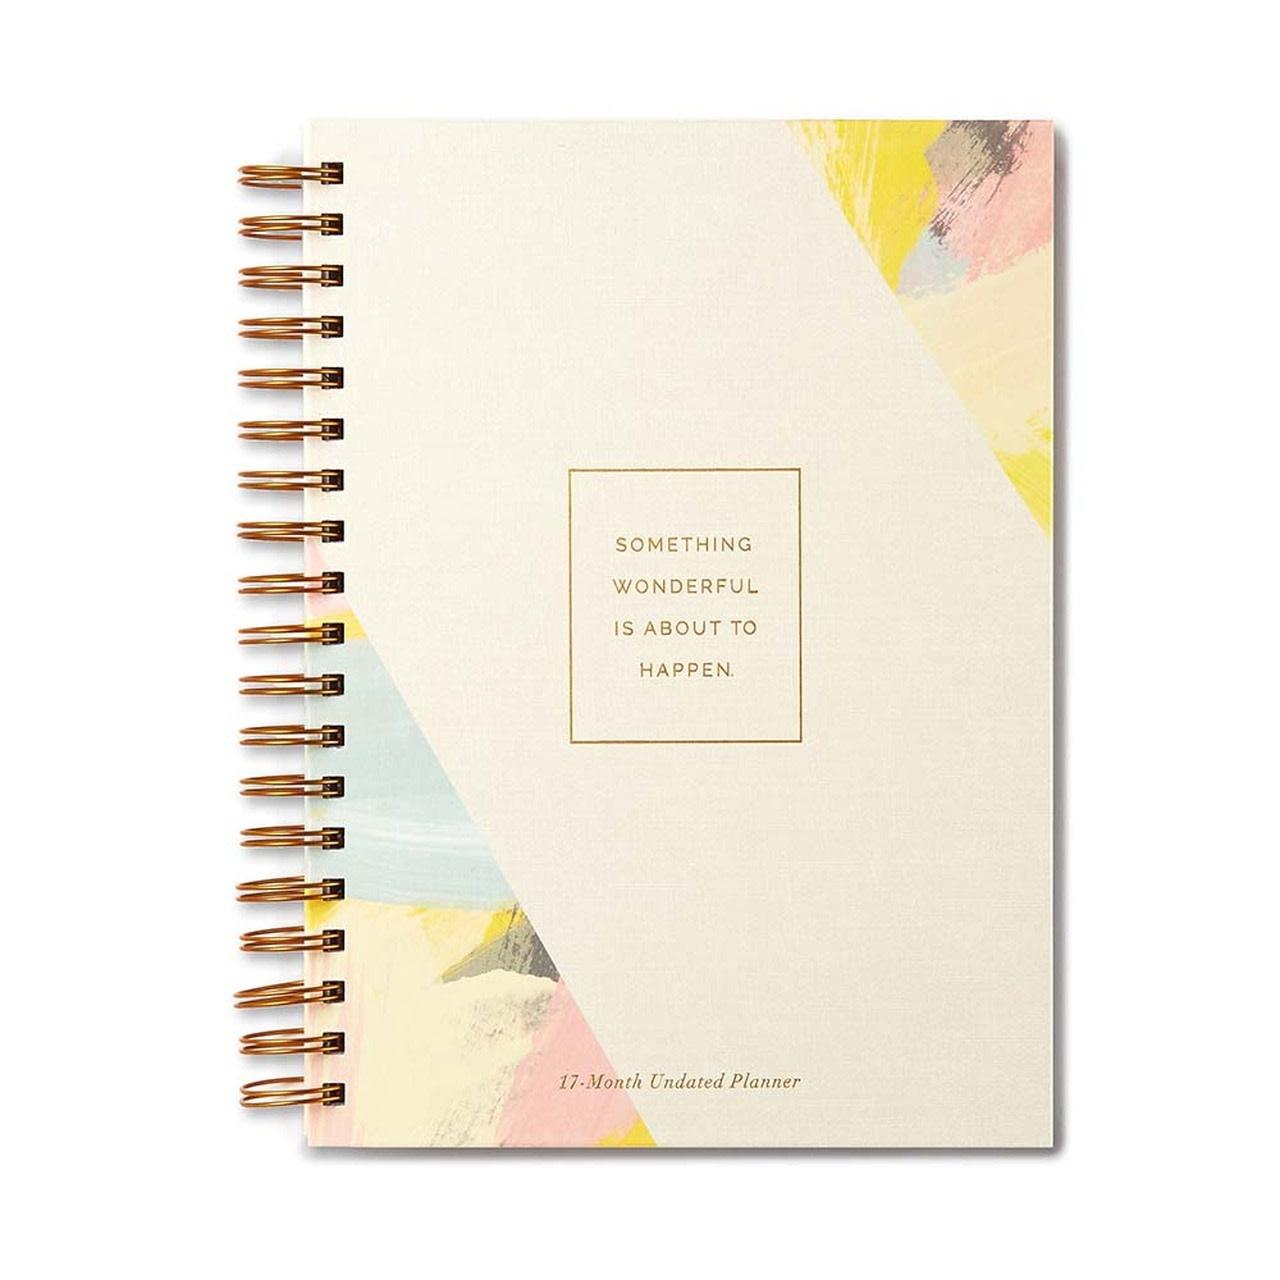 Compendium - COM COM AG - Something Wonderful 17-Month Undated Spiral-bound Planner